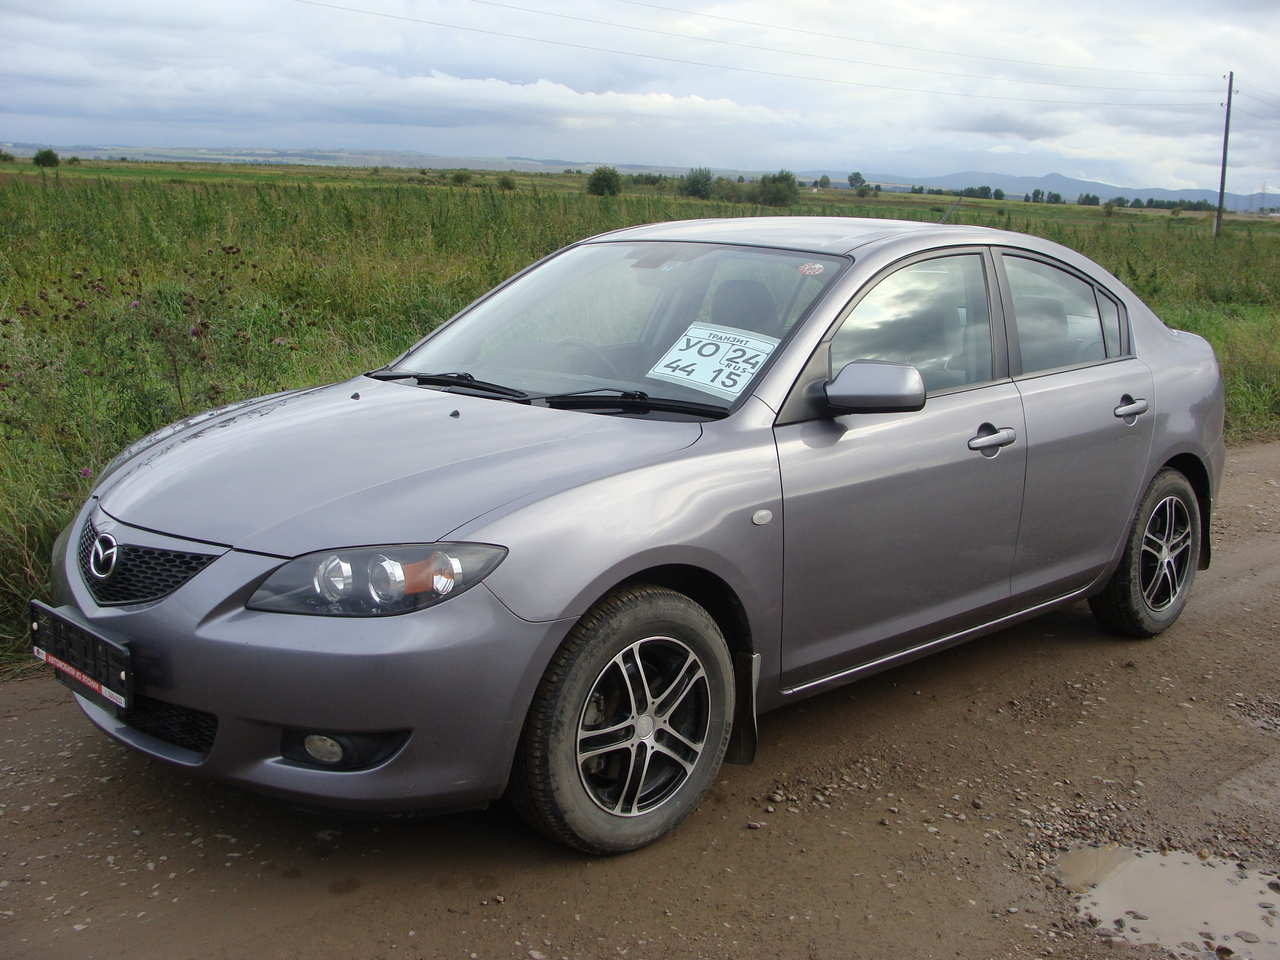 Mazdaspeed3 For Sale >> 2004 Mazda Axela Photos, 1.5, Gasoline, FF, Automatic For Sale